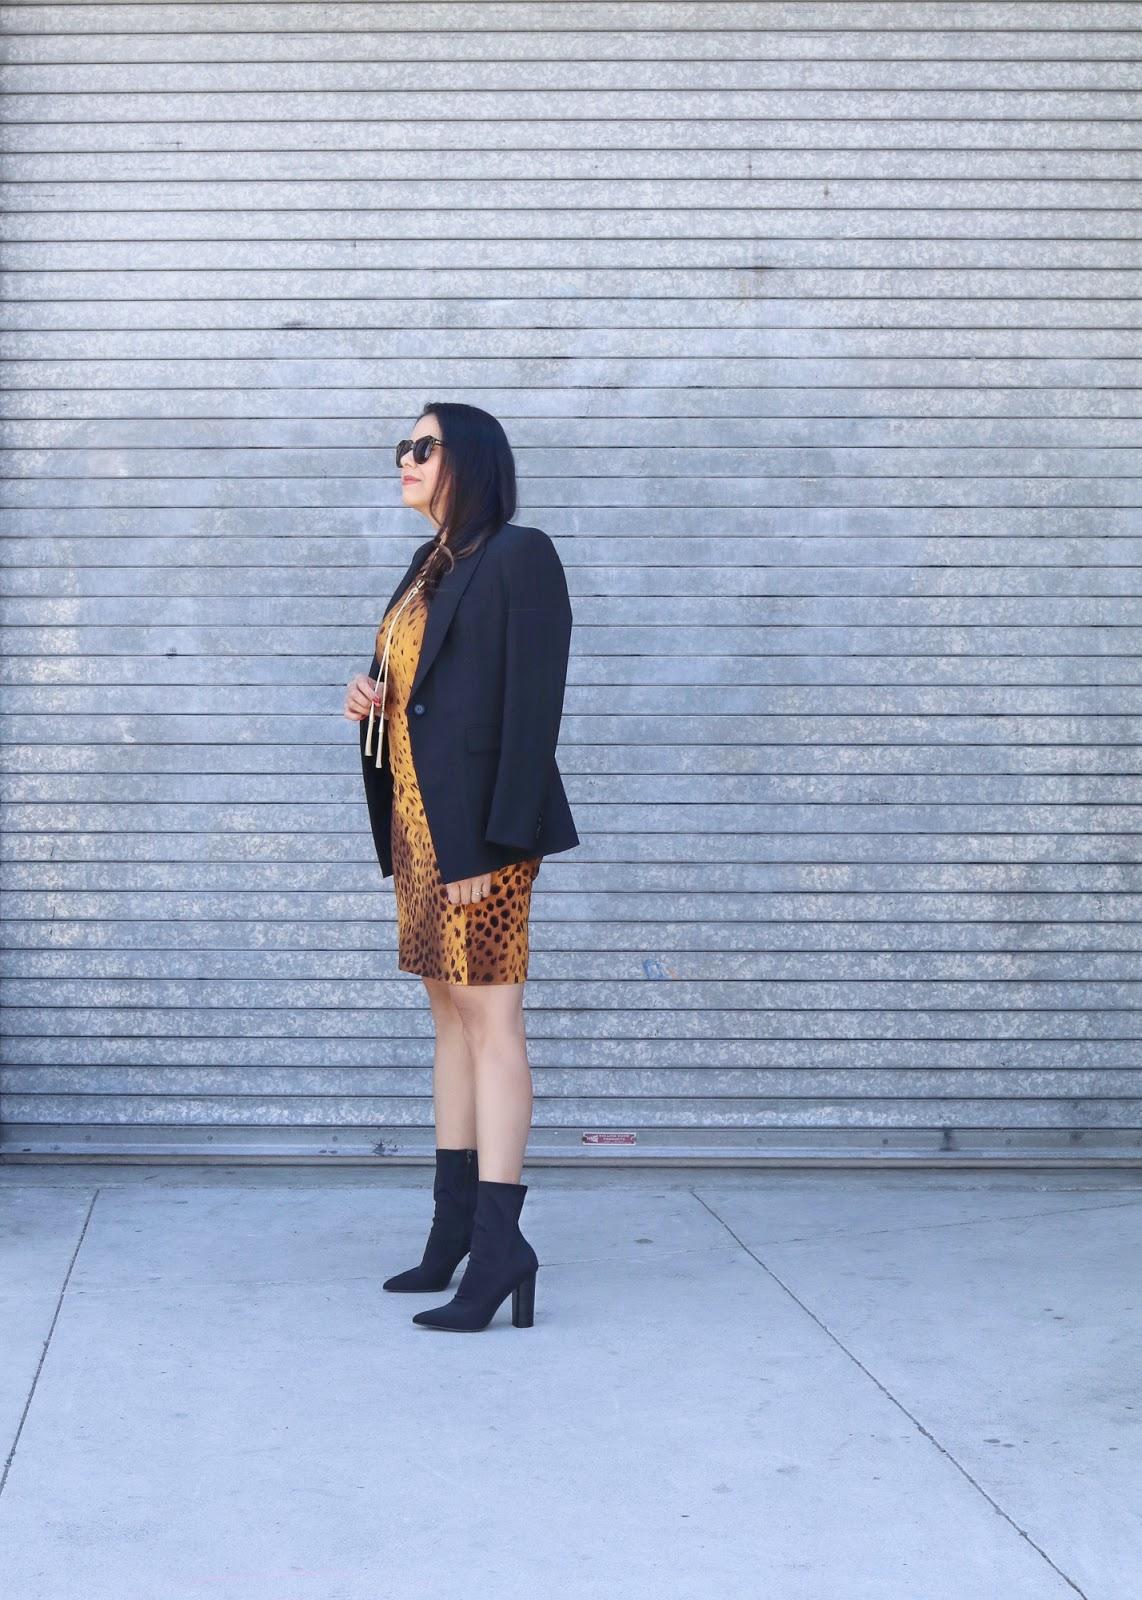 latina fashion blogger 2018, stylish mom blogger 2018